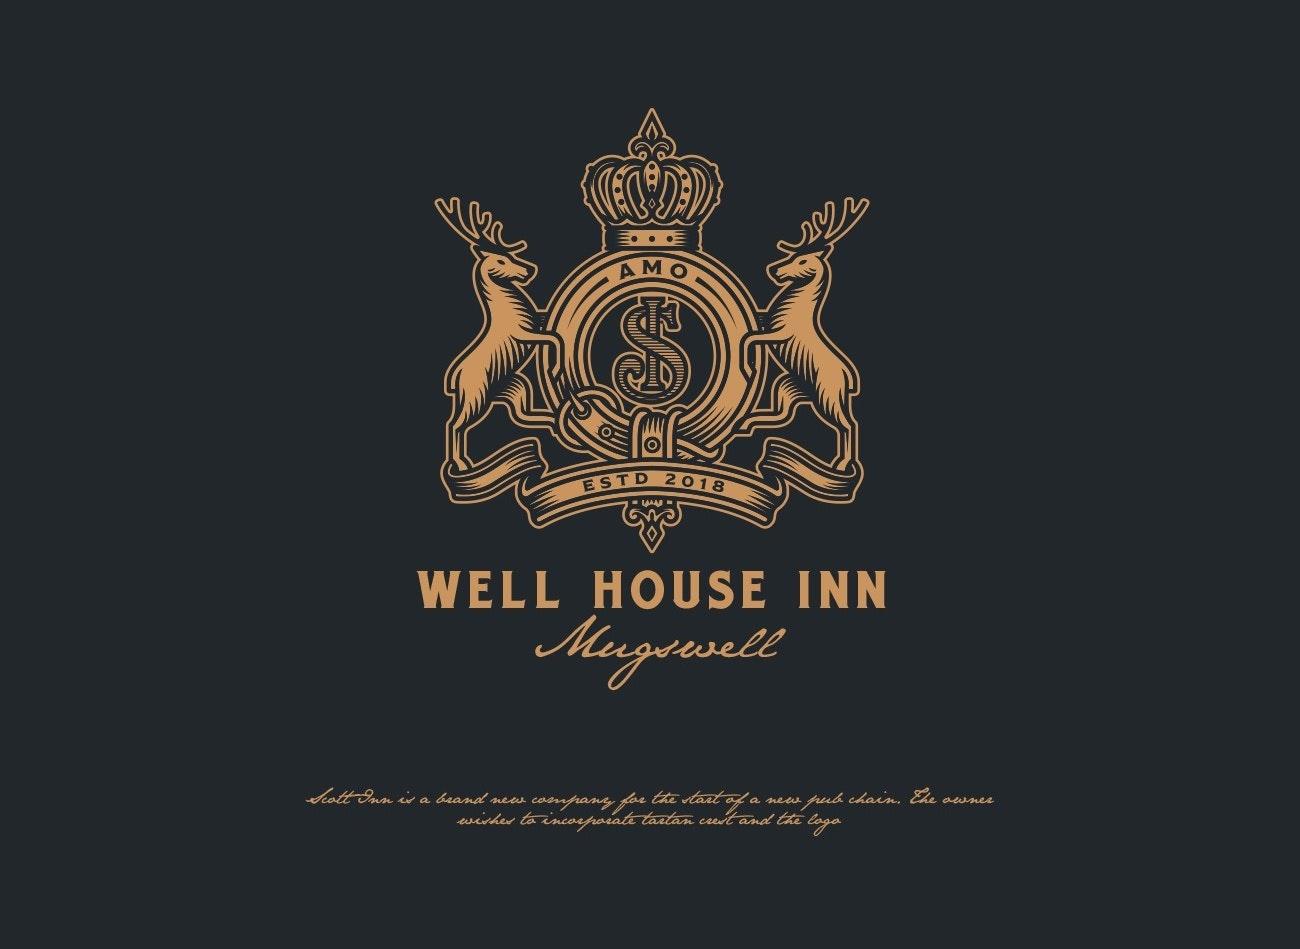 Well House Inn Mugswell logo